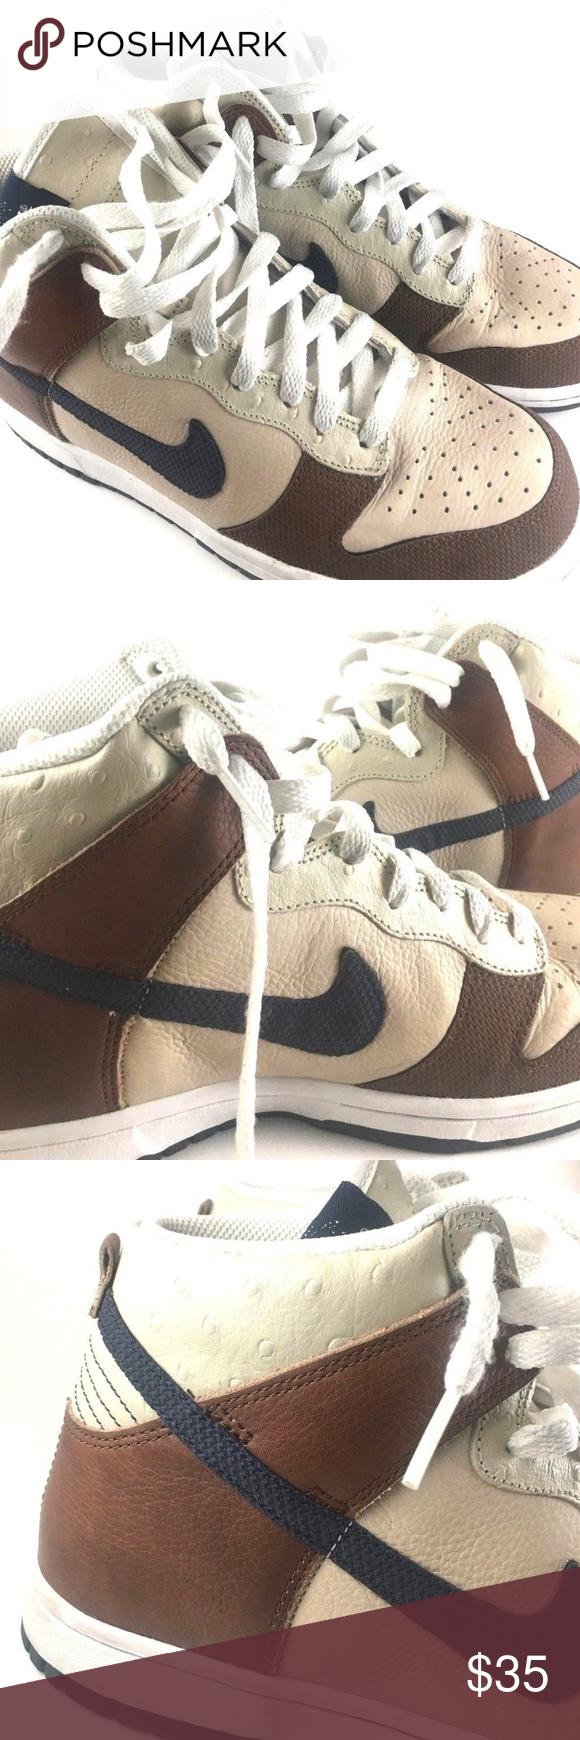 premium selection dd0d3 0700d NIKE Dunk High Premium Shoes Soft Leather NIKE Dunk High ...